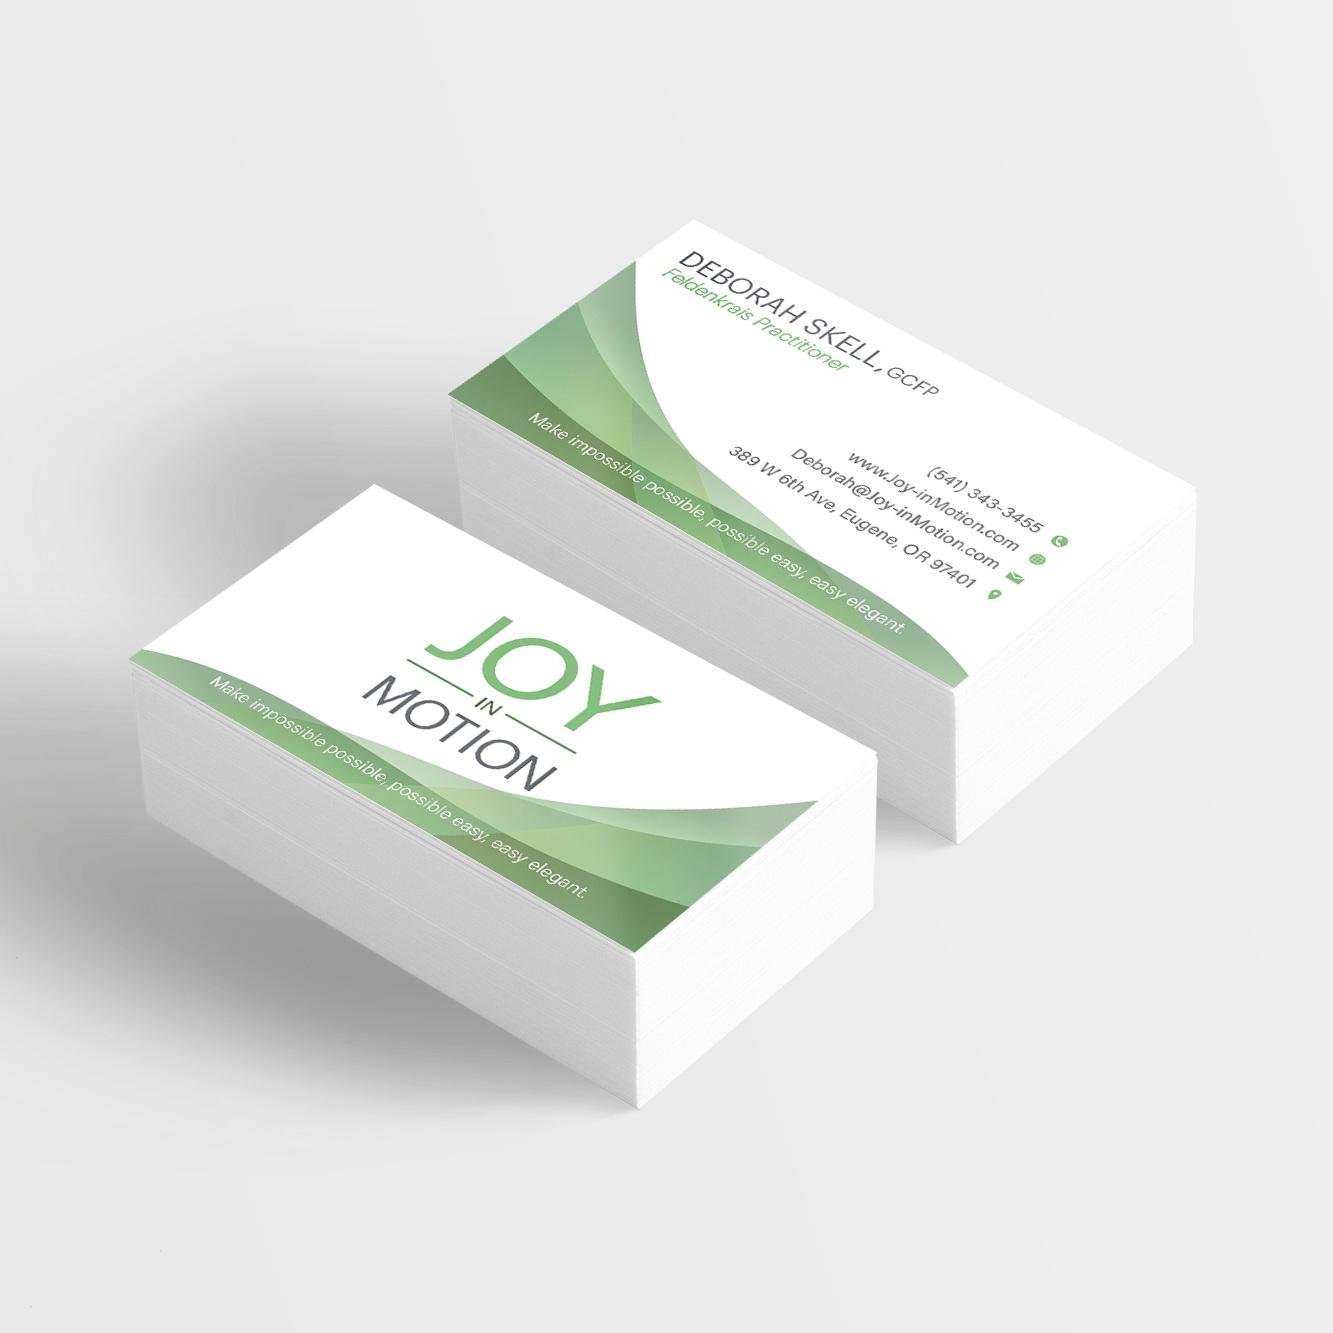 2019-Joy-In-Motion-Business-Card-R3.jpg